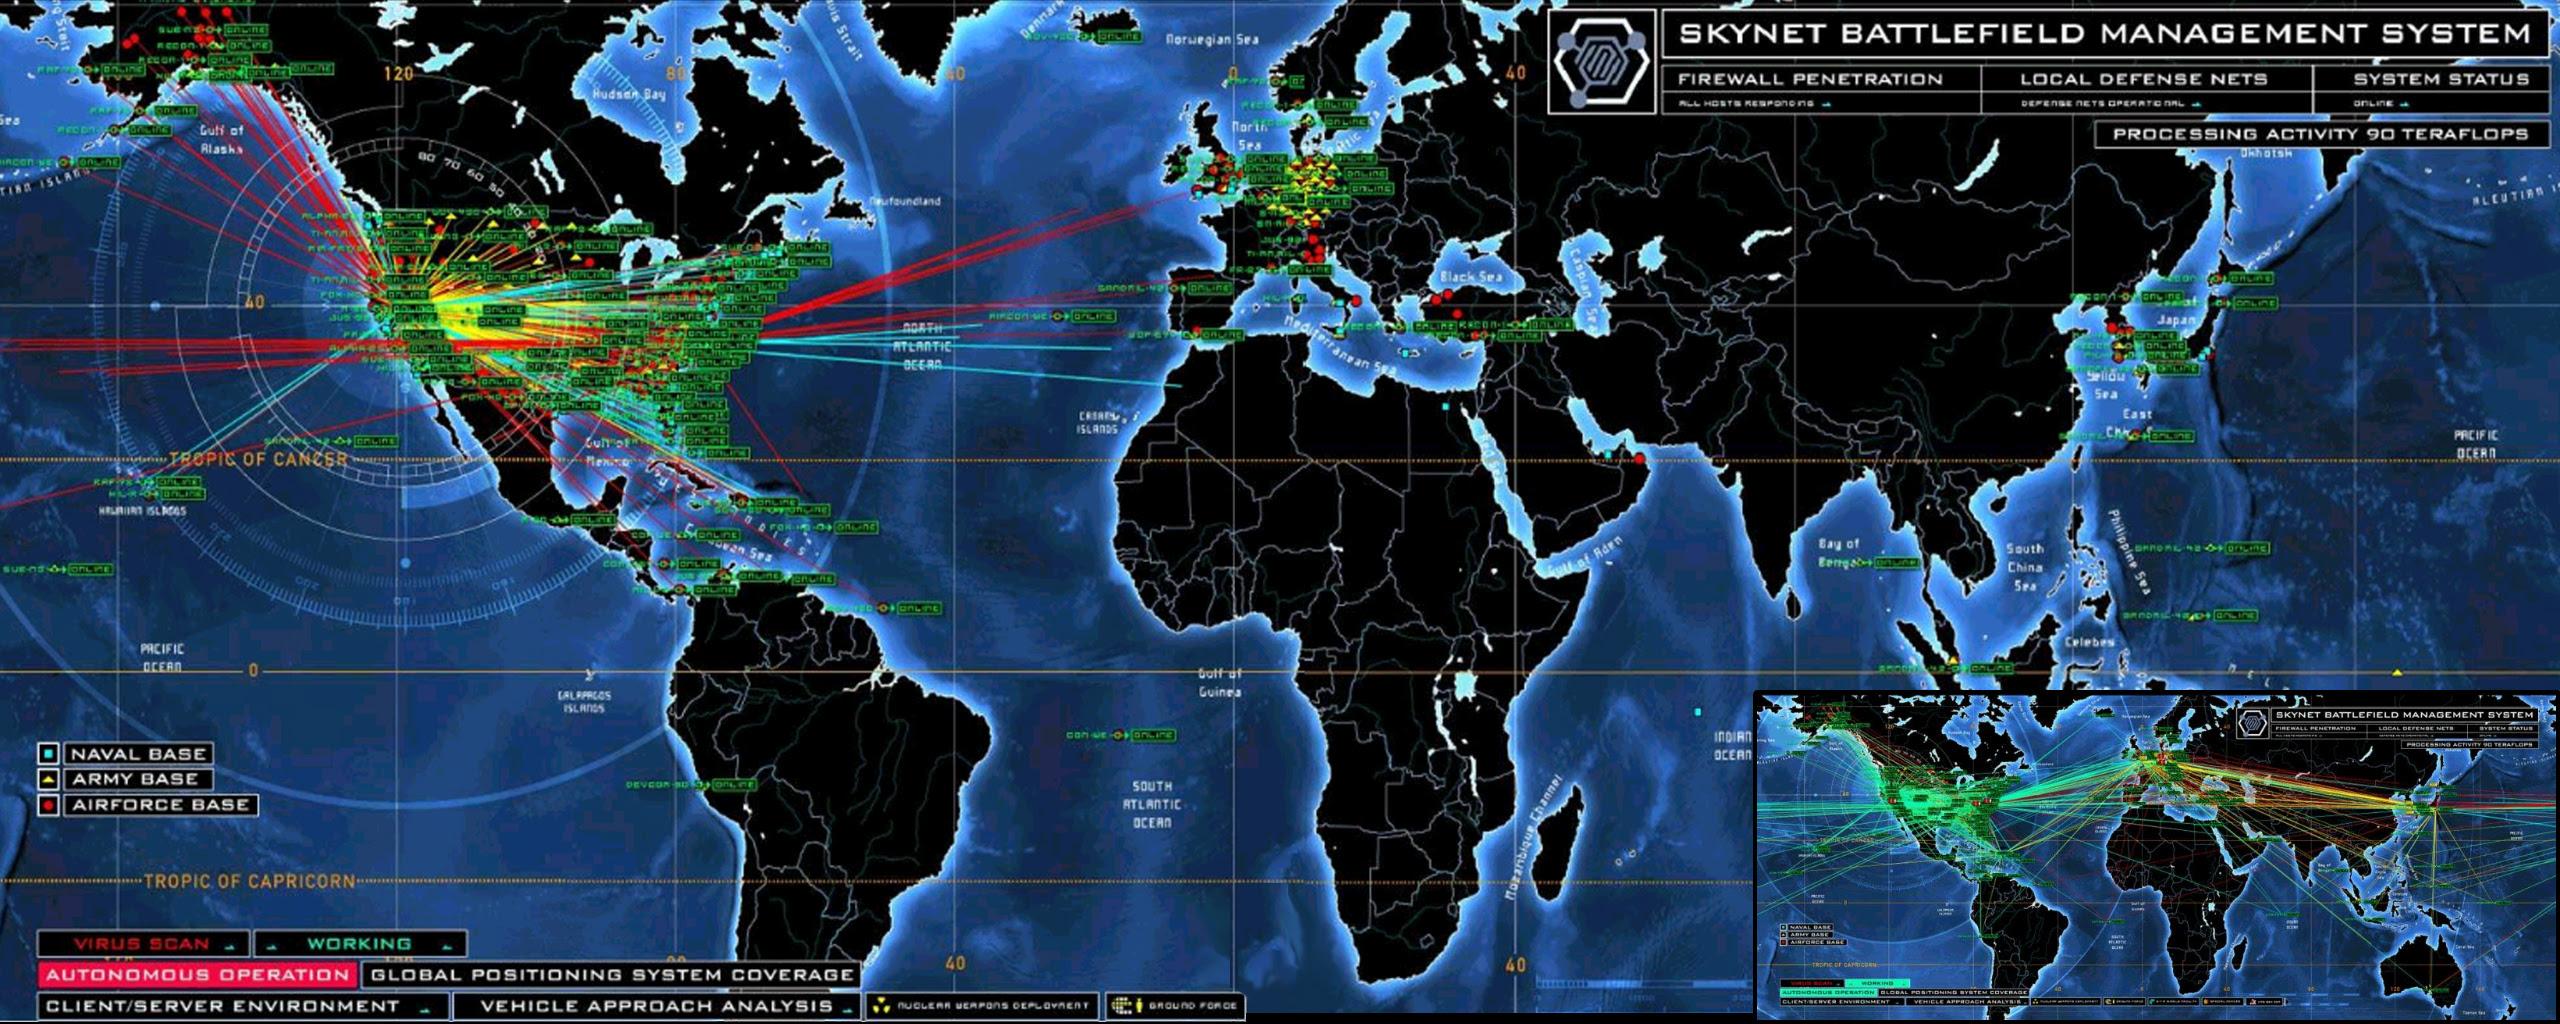 Skynet, NSA, curiosidades, vigilancia, estados unidos, terrorismo,